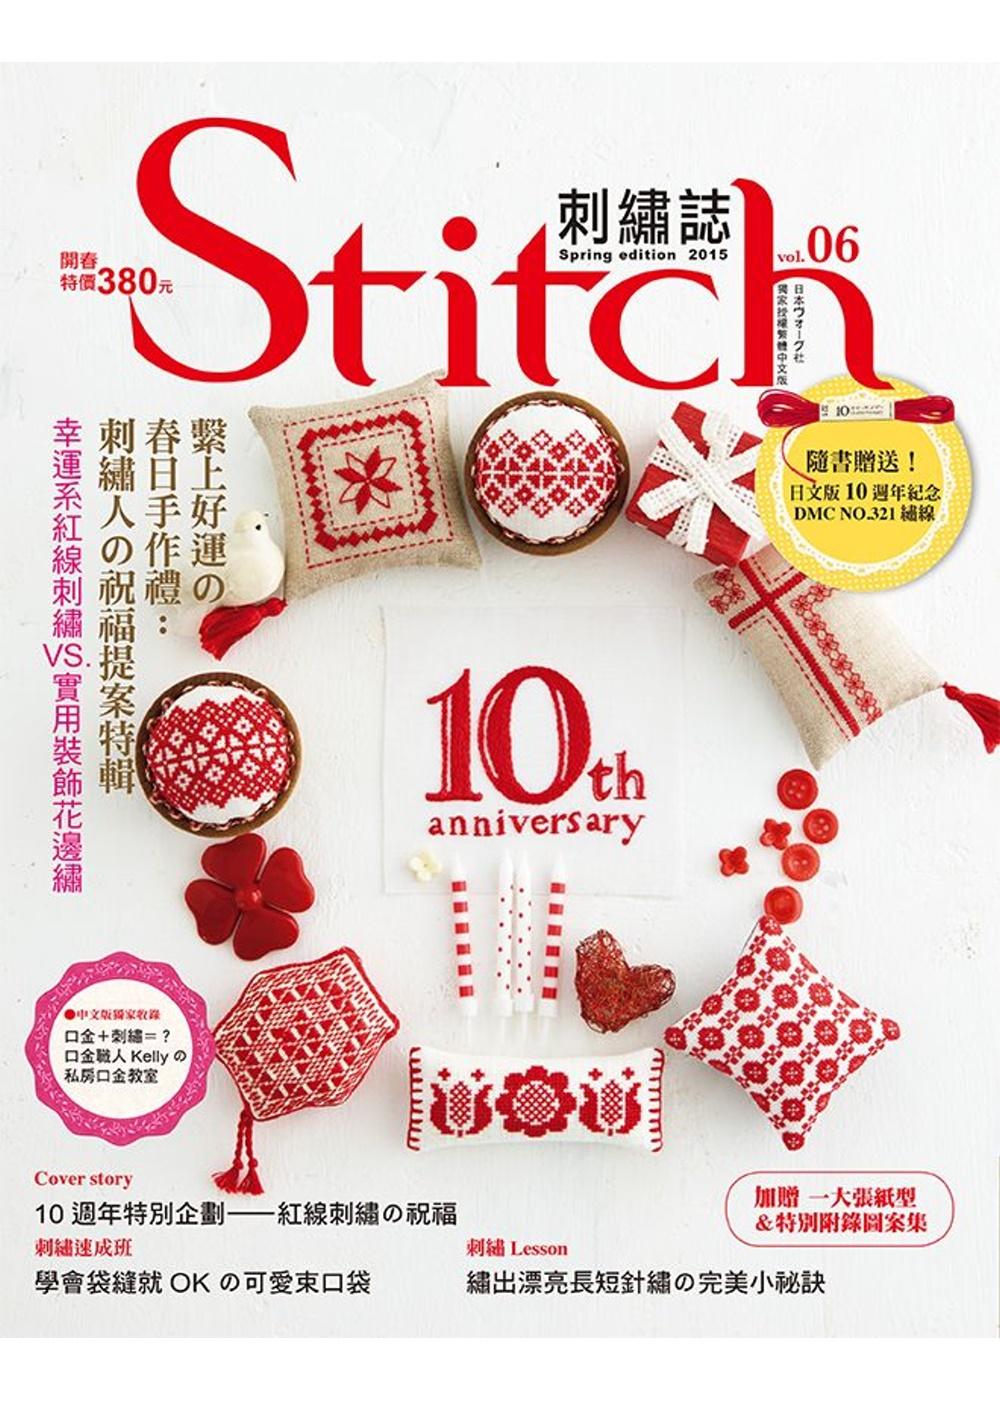 Stitch刺繡誌06 繫上好運の春日手作禮:刺繡人の祝福提案特輯 幸運系紅線刺繡VS 裝